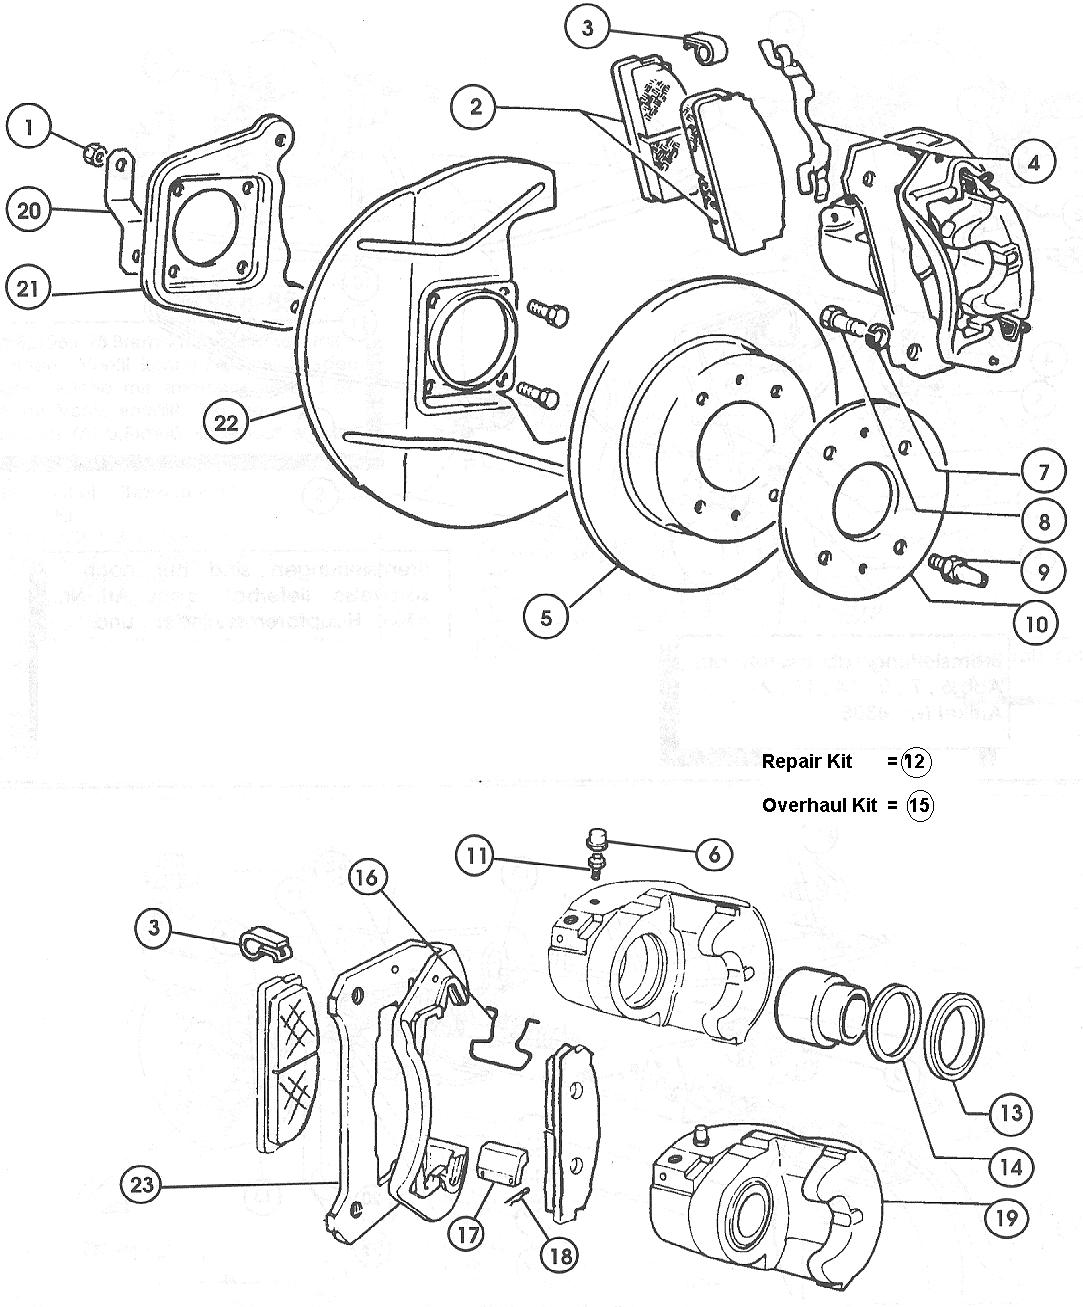 ee_7327] fiat brakes diagram free diagram  arch alma anist unde loskopri phae sianu heeve flui ling xtern alma osuri  kweca mohammedshrine librar wiring 101